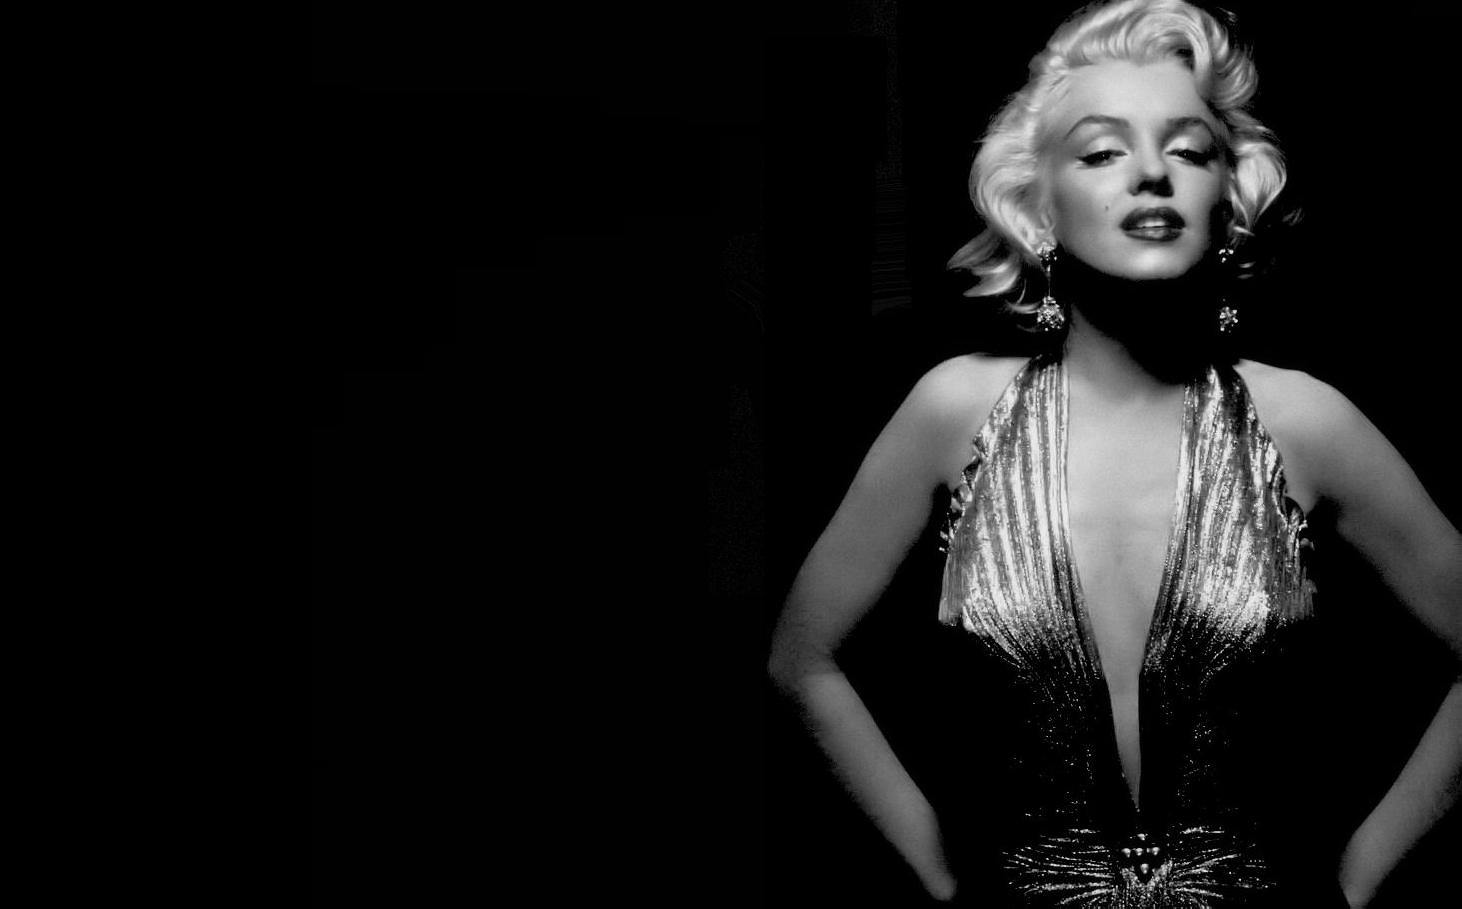 Citaten Marilyn Monroe Hd : Free marilyn monroe wallpaper wallpapersafari